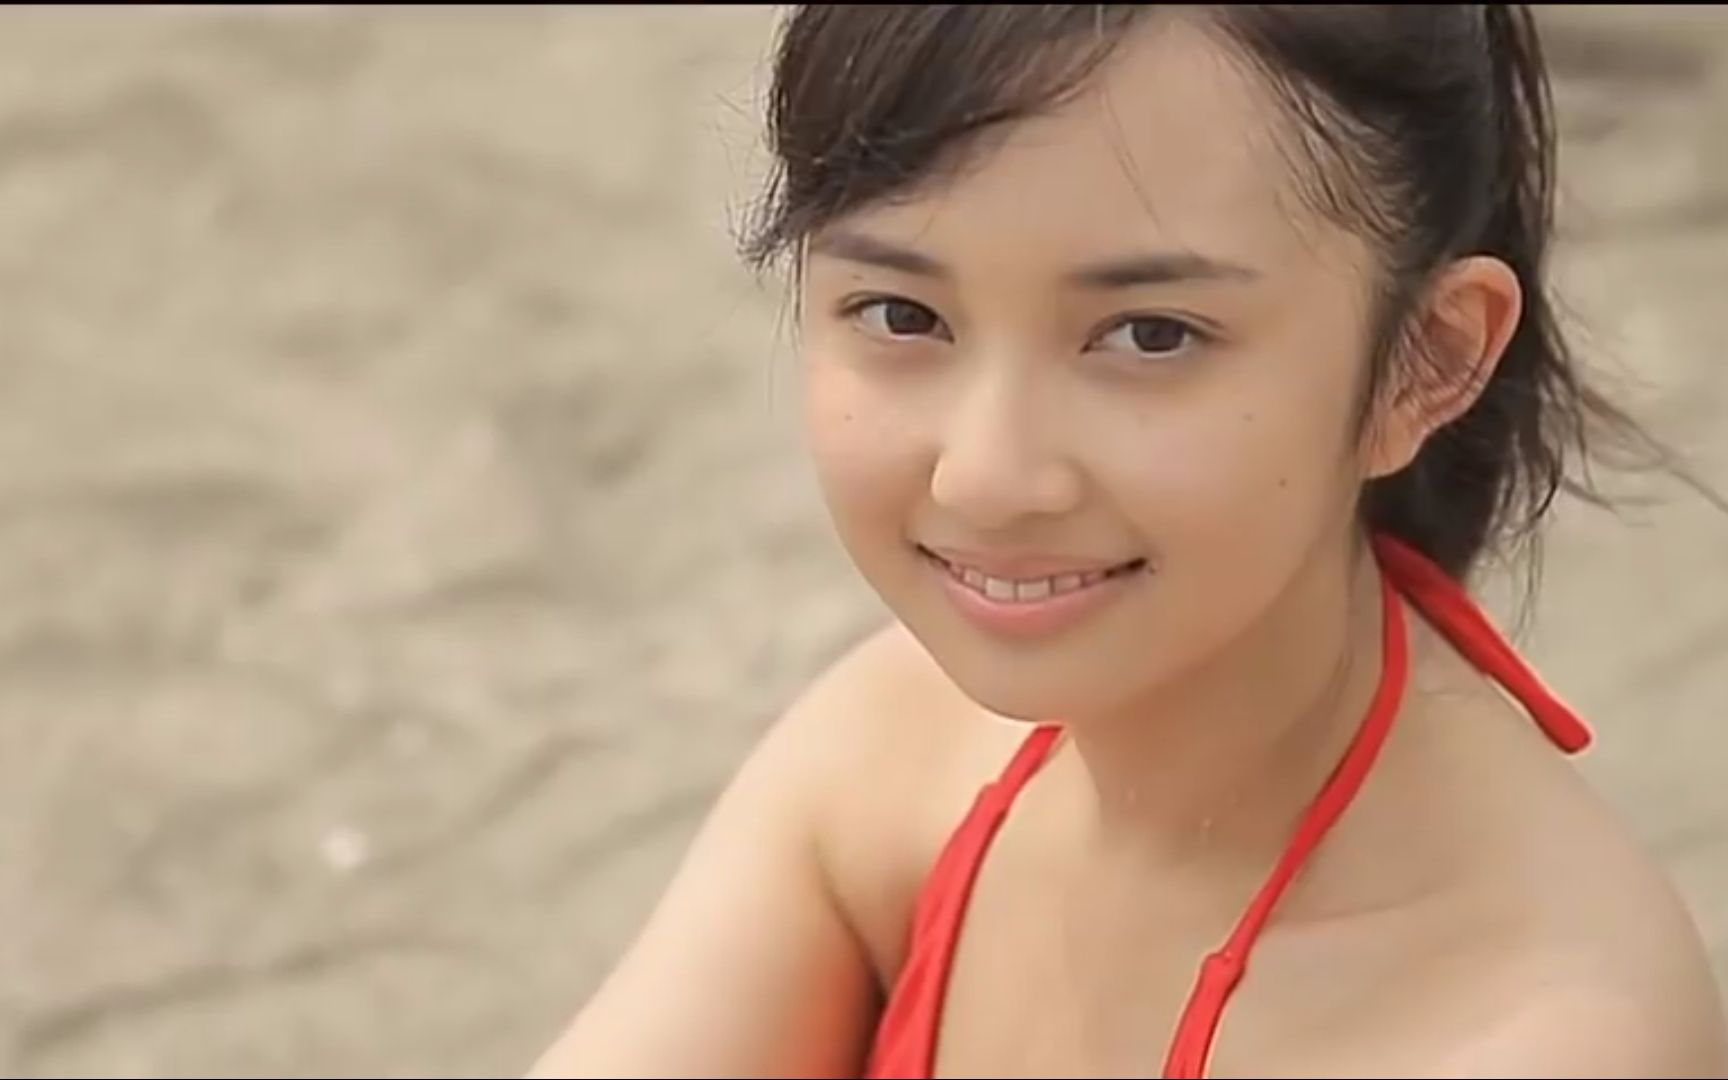 黑宫写真_小宫有纱青涩的19岁『nineteen』_哔哩哔哩 (゜-゜)つロ 干杯~-bilibili